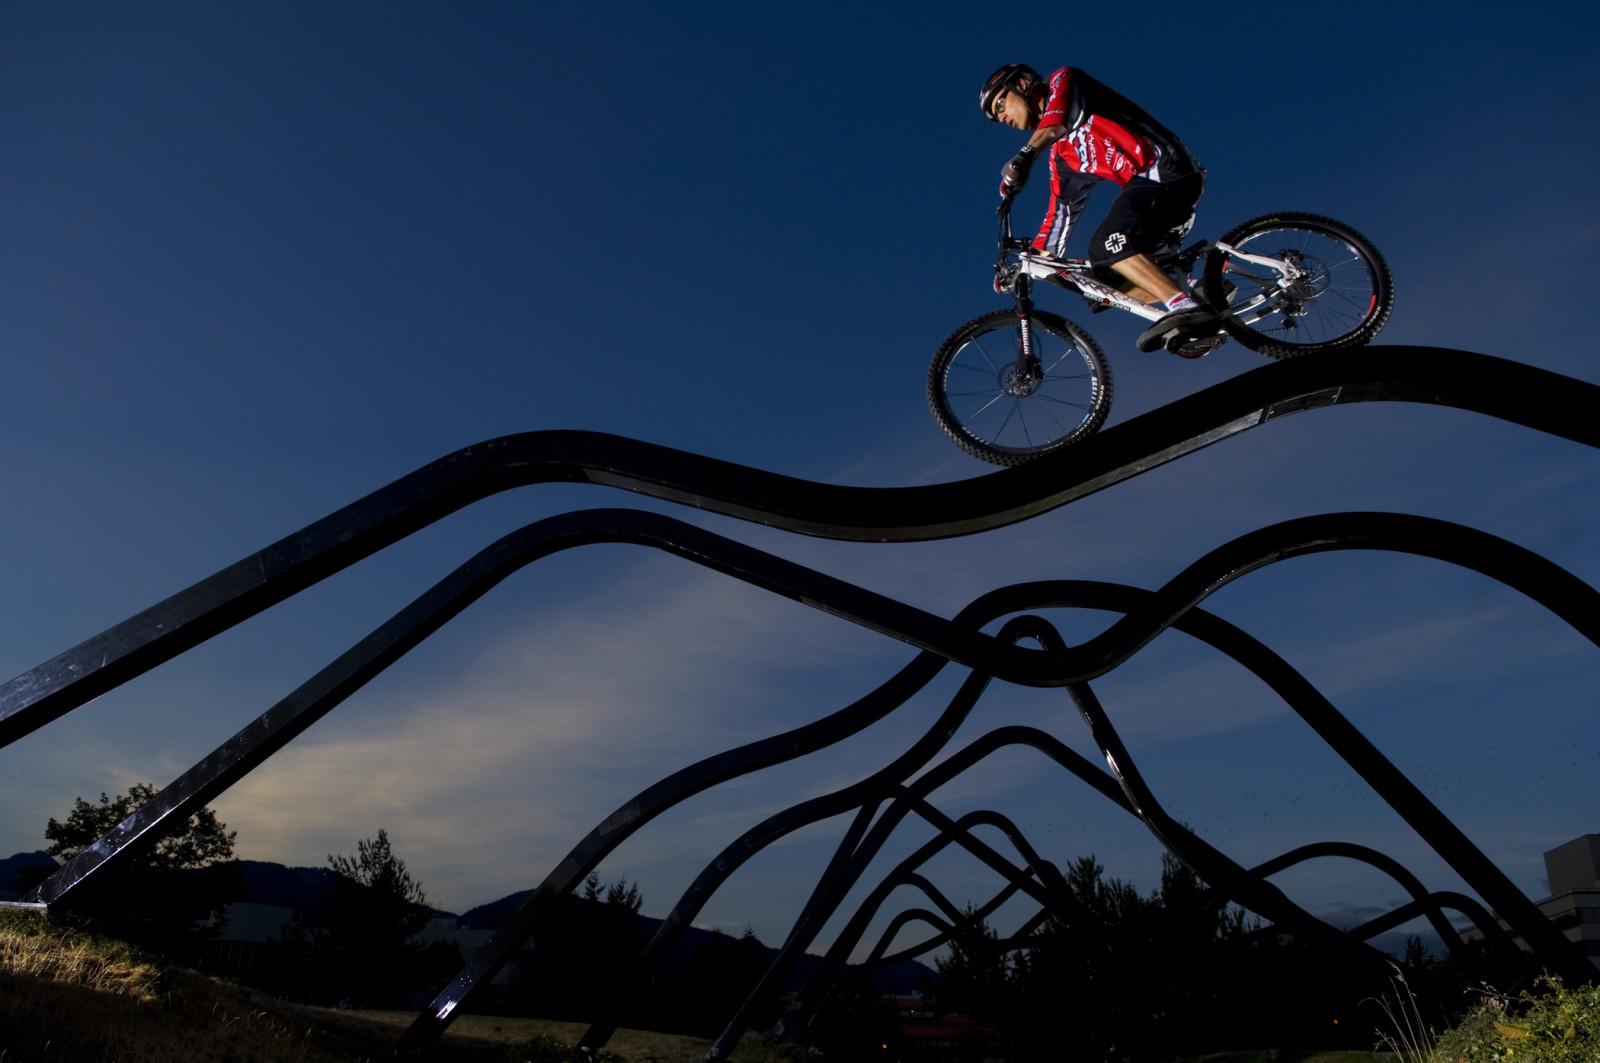 Location: North Vancouver, BC Athlete: Ryan Leech